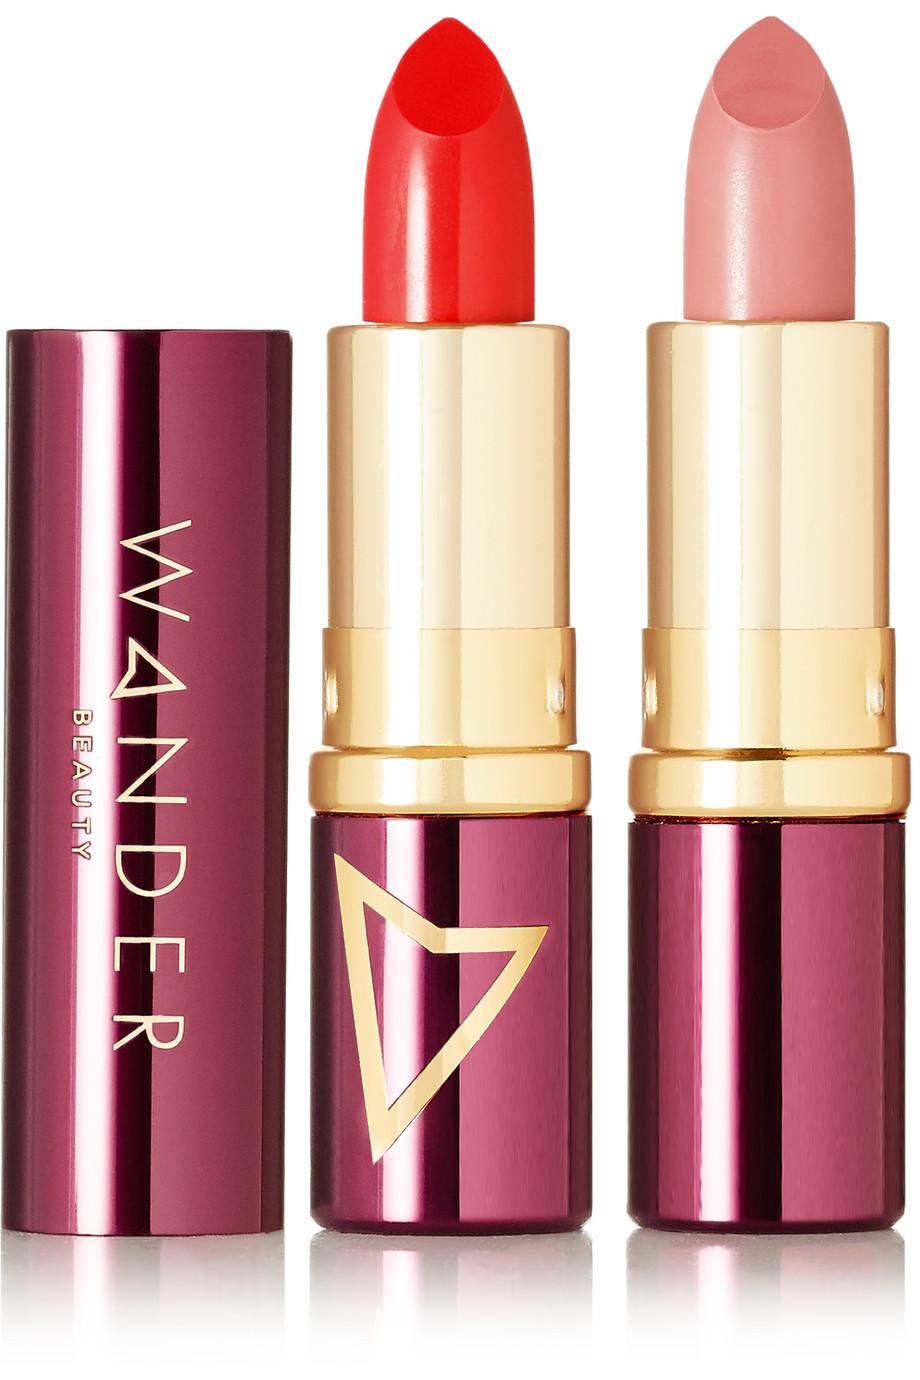 Wanderout Dual Lipstick - GNO/ Date Night